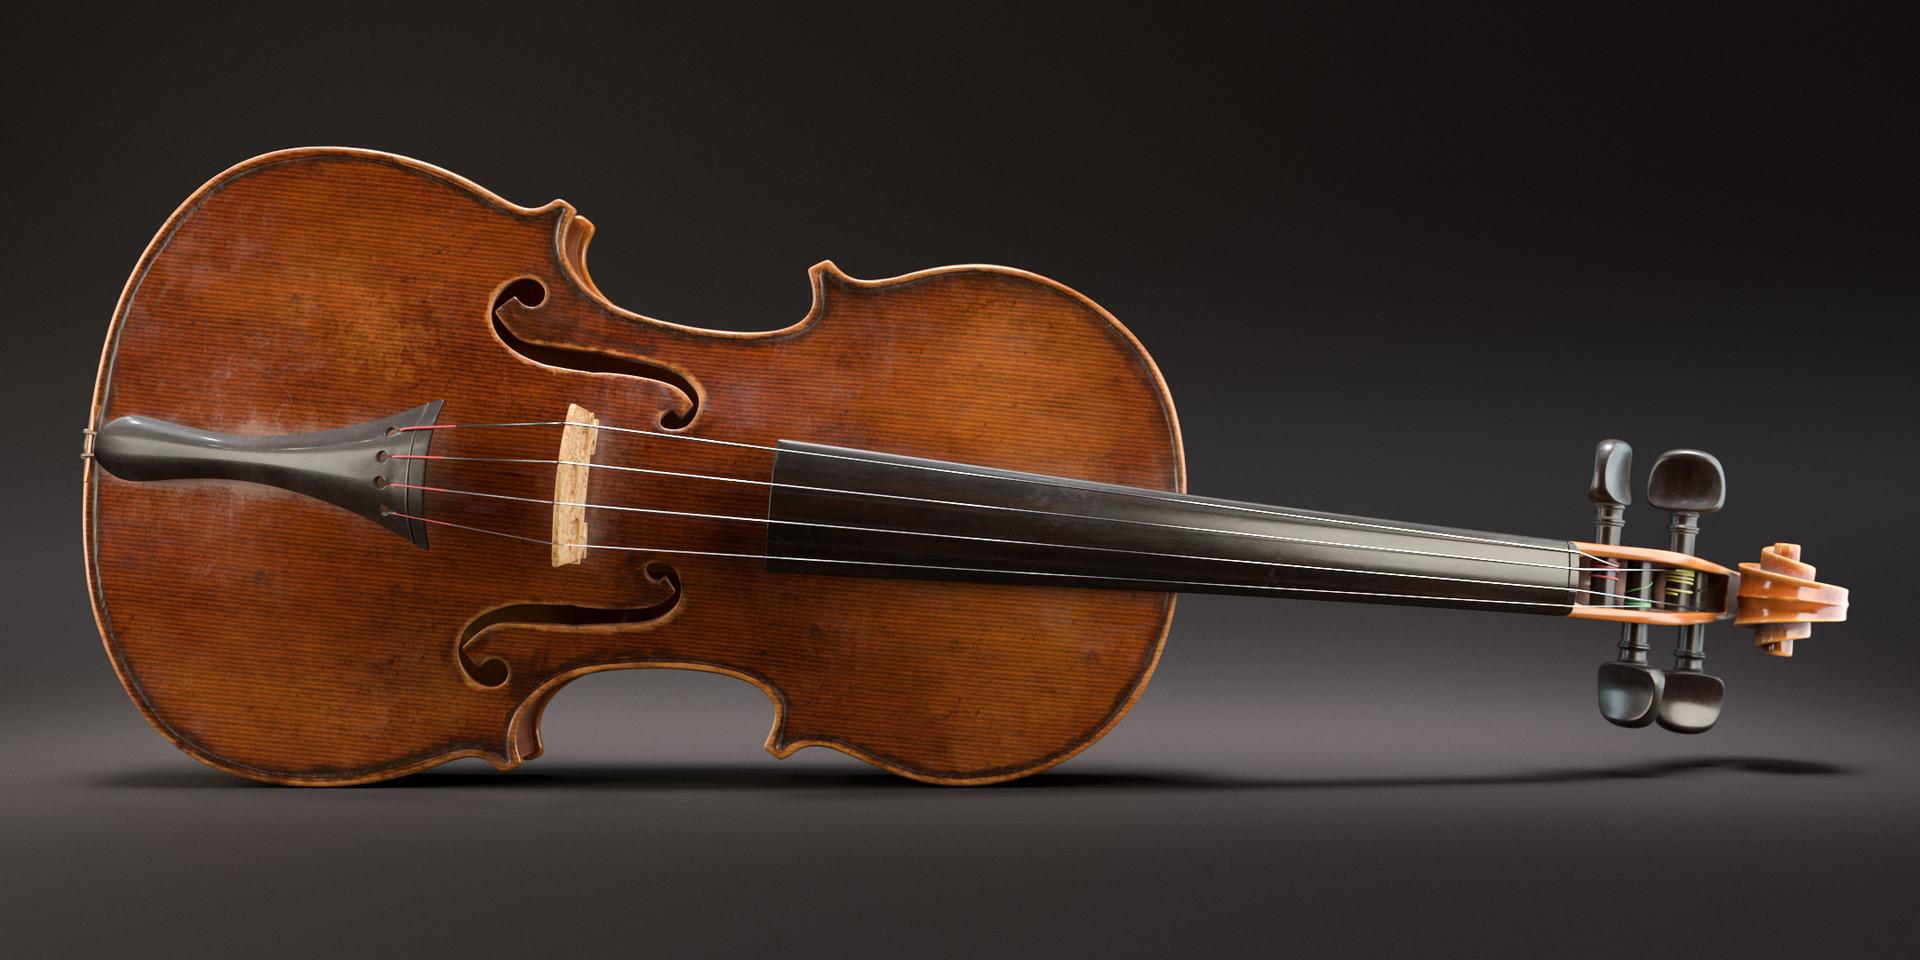 Gustav berg pedersen violinstudio wide01